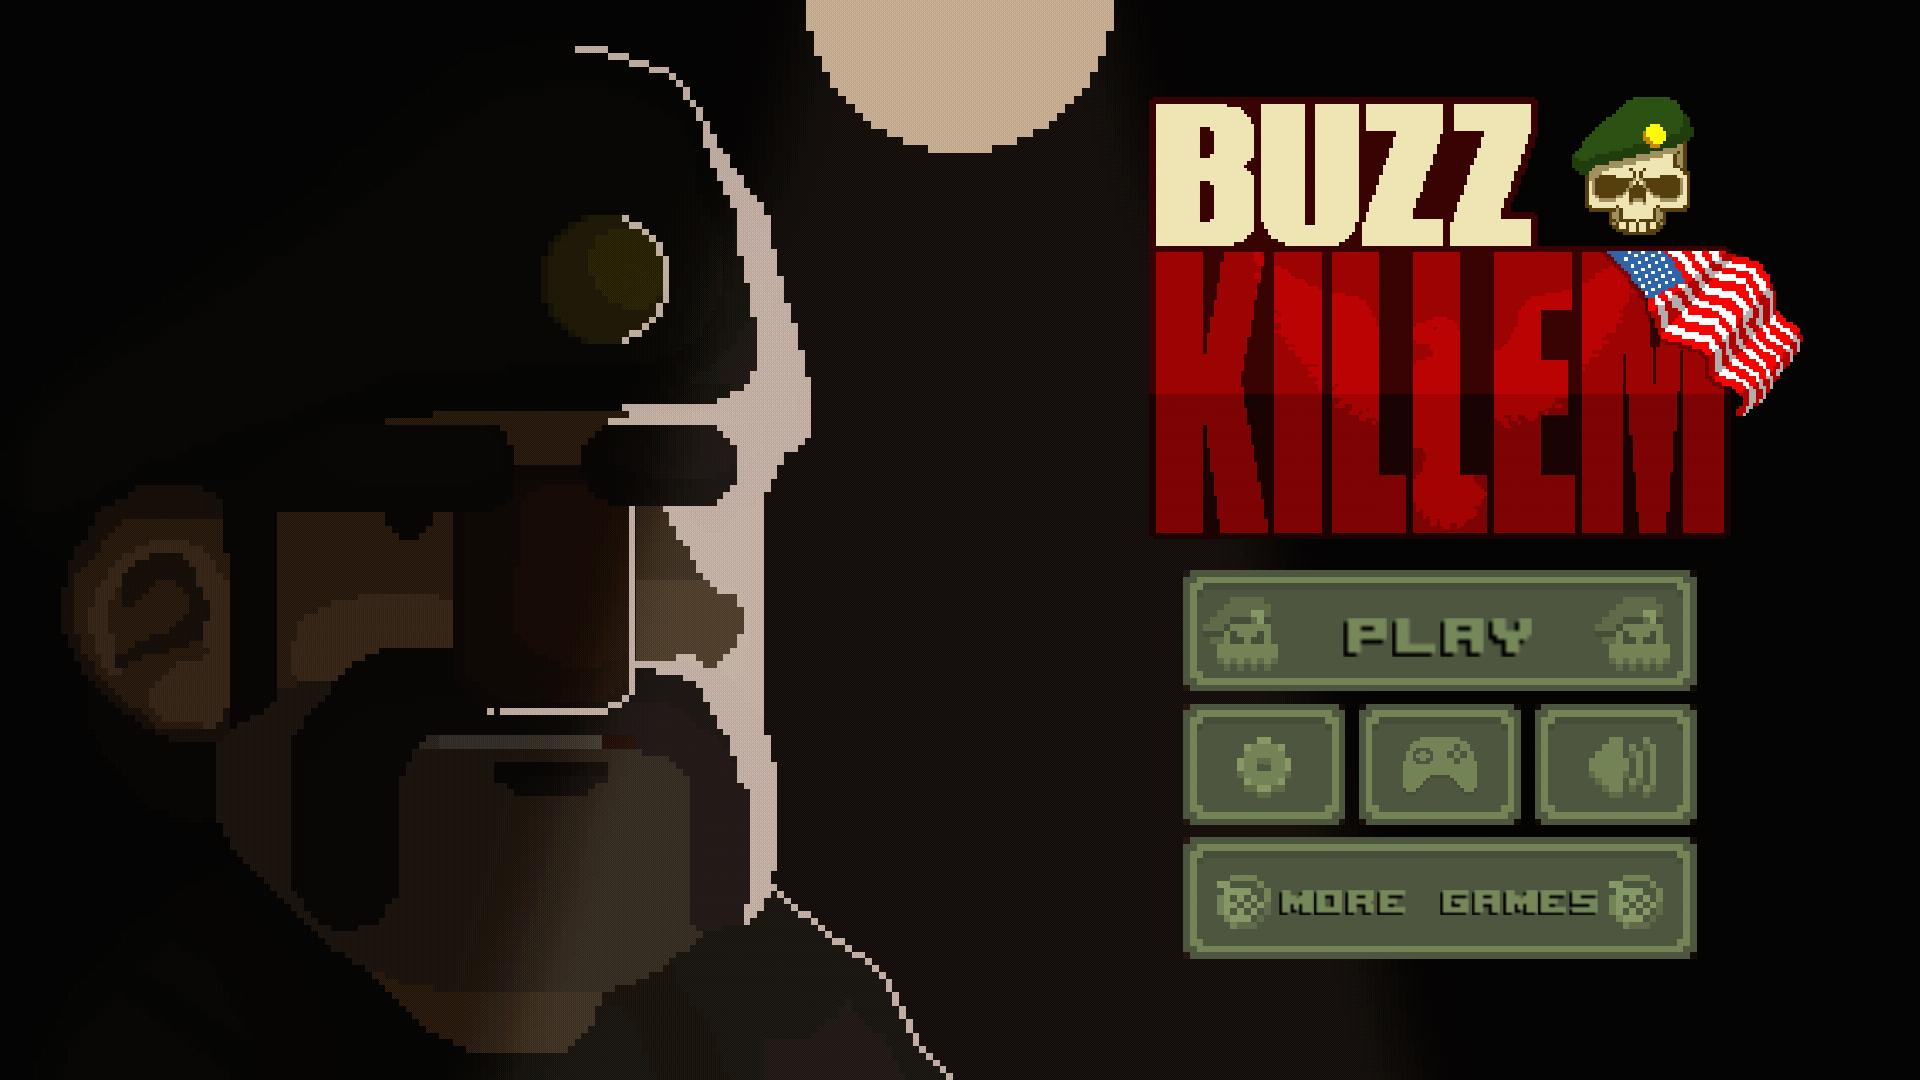 Buzz Killem screenshot #7